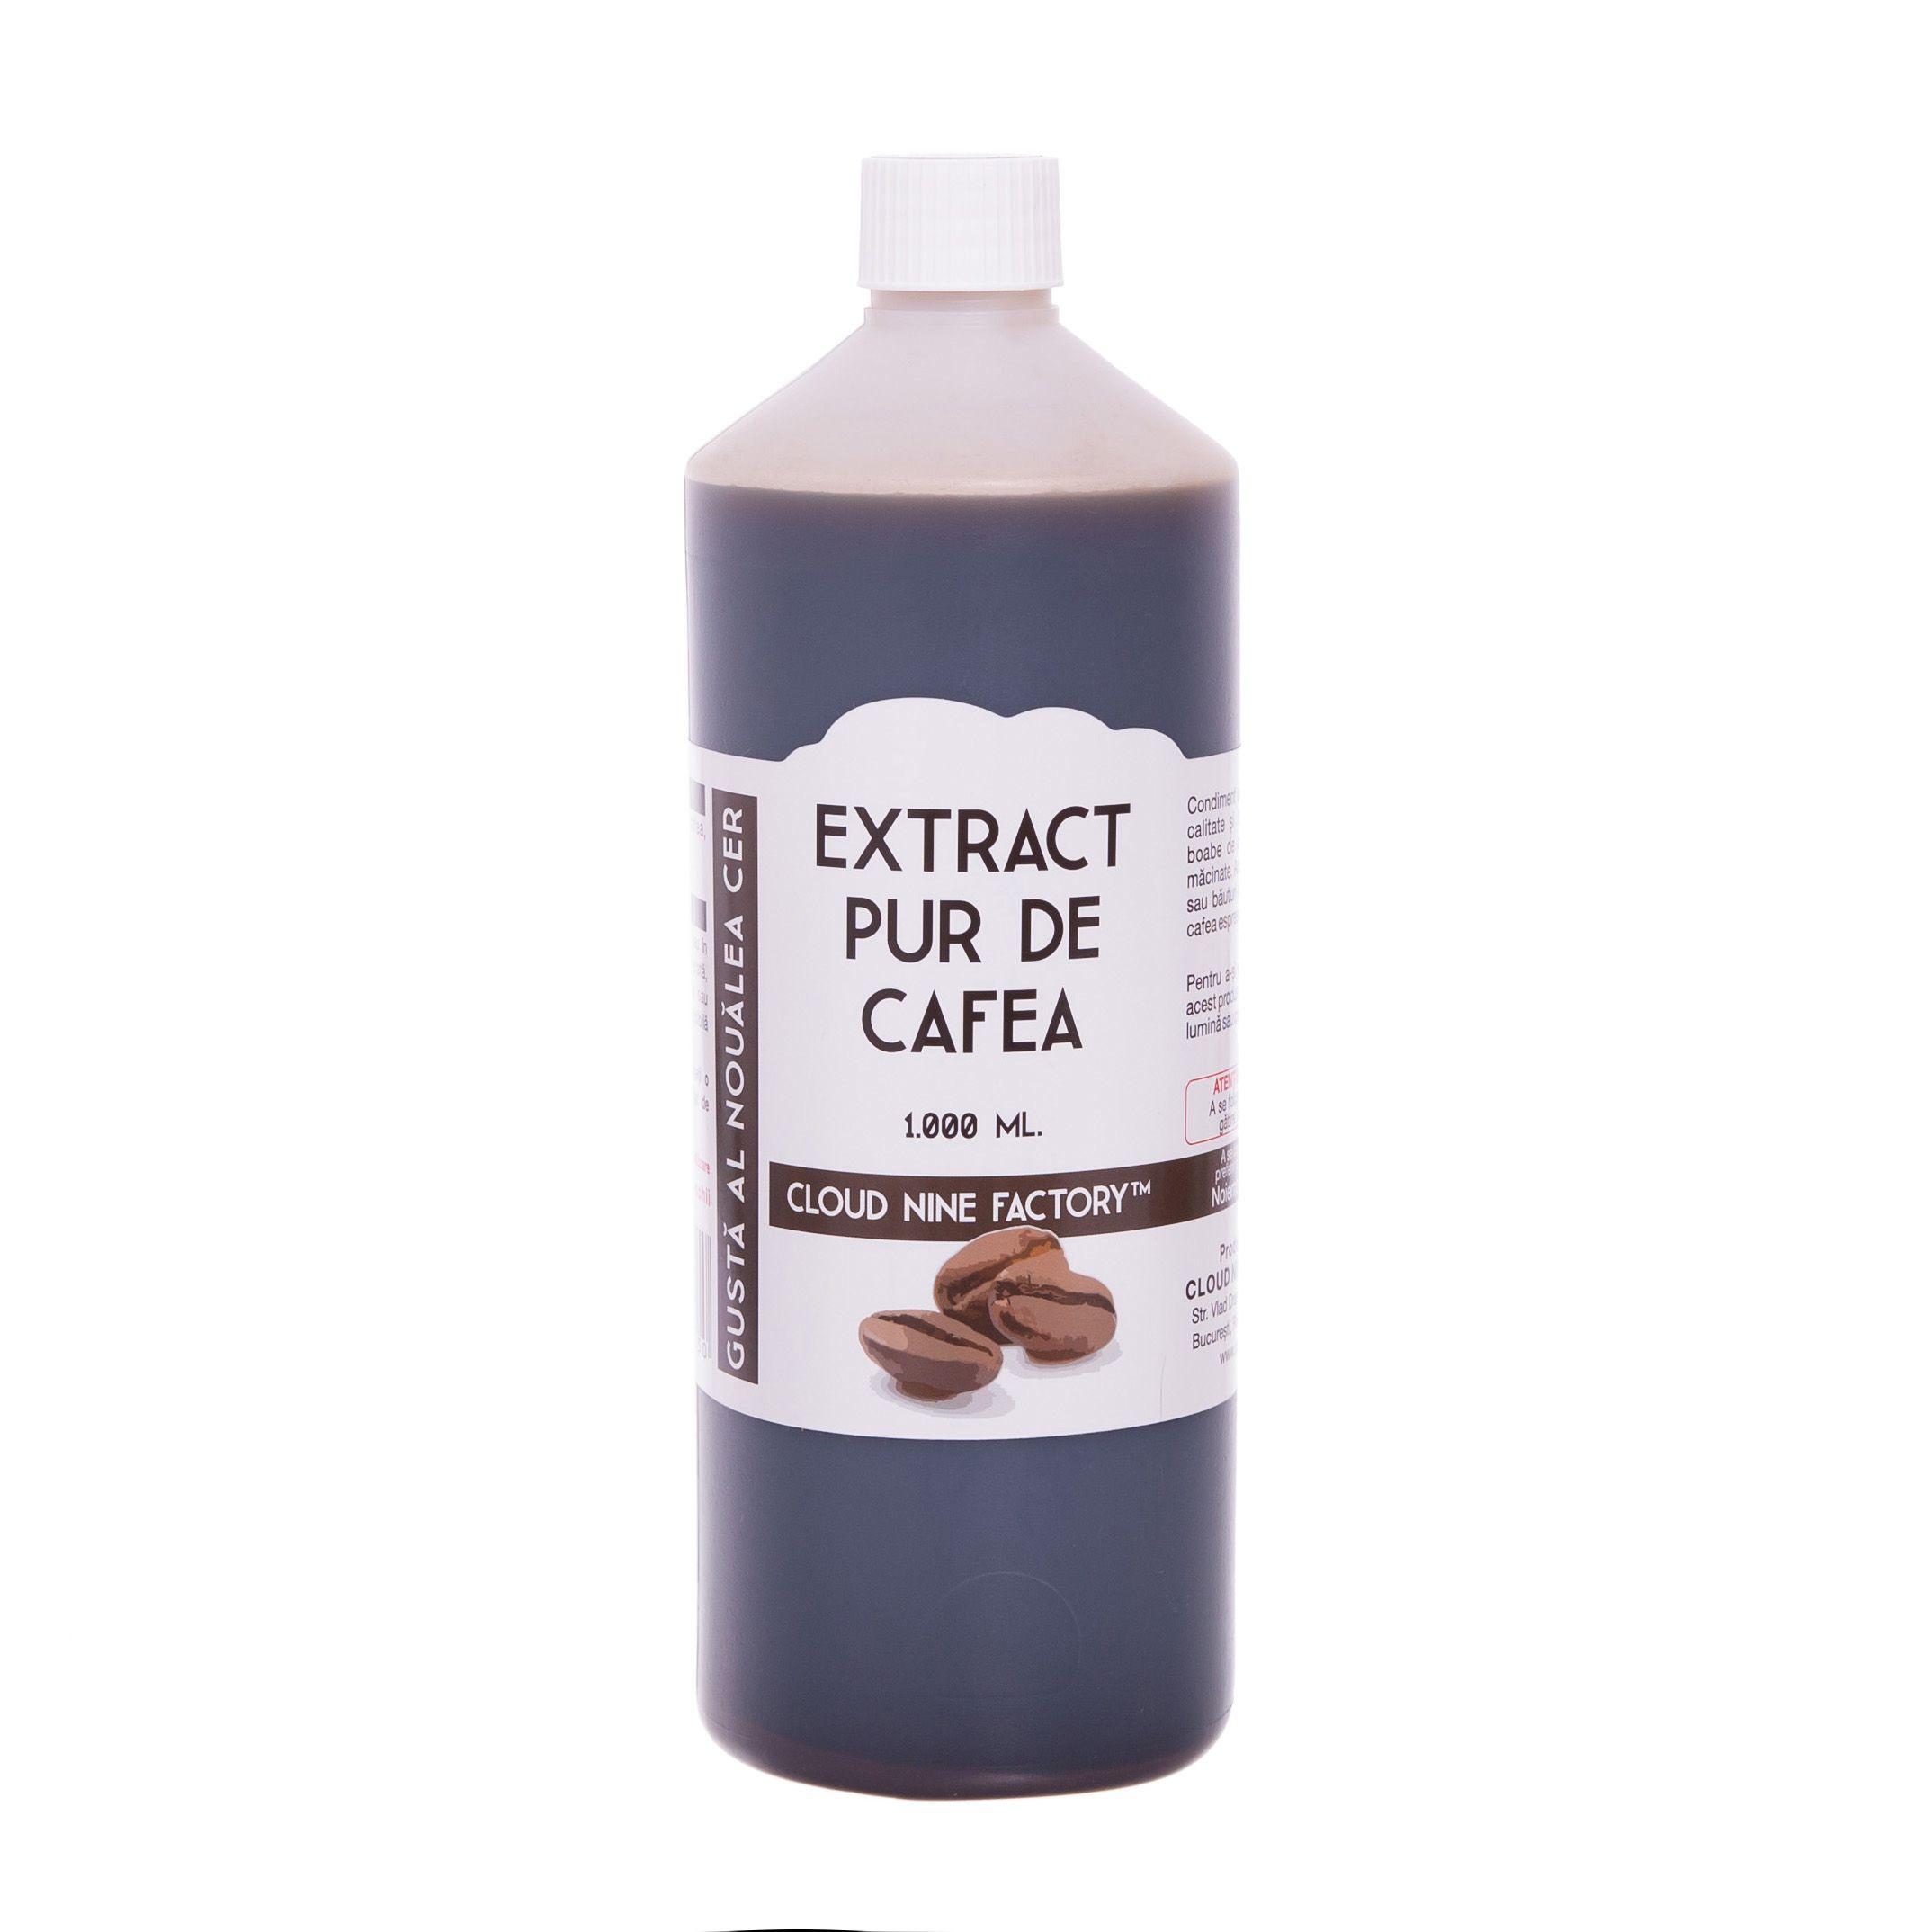 Extract Pur de Cafea (1.000 ml.) extract pur de cafea (1.000 ml.) - IMG 2656 - Extract Pur de Cafea (1.000 ml.) Extract Pur de Cafea - IMG 2656 - Extract Pur de Cafea